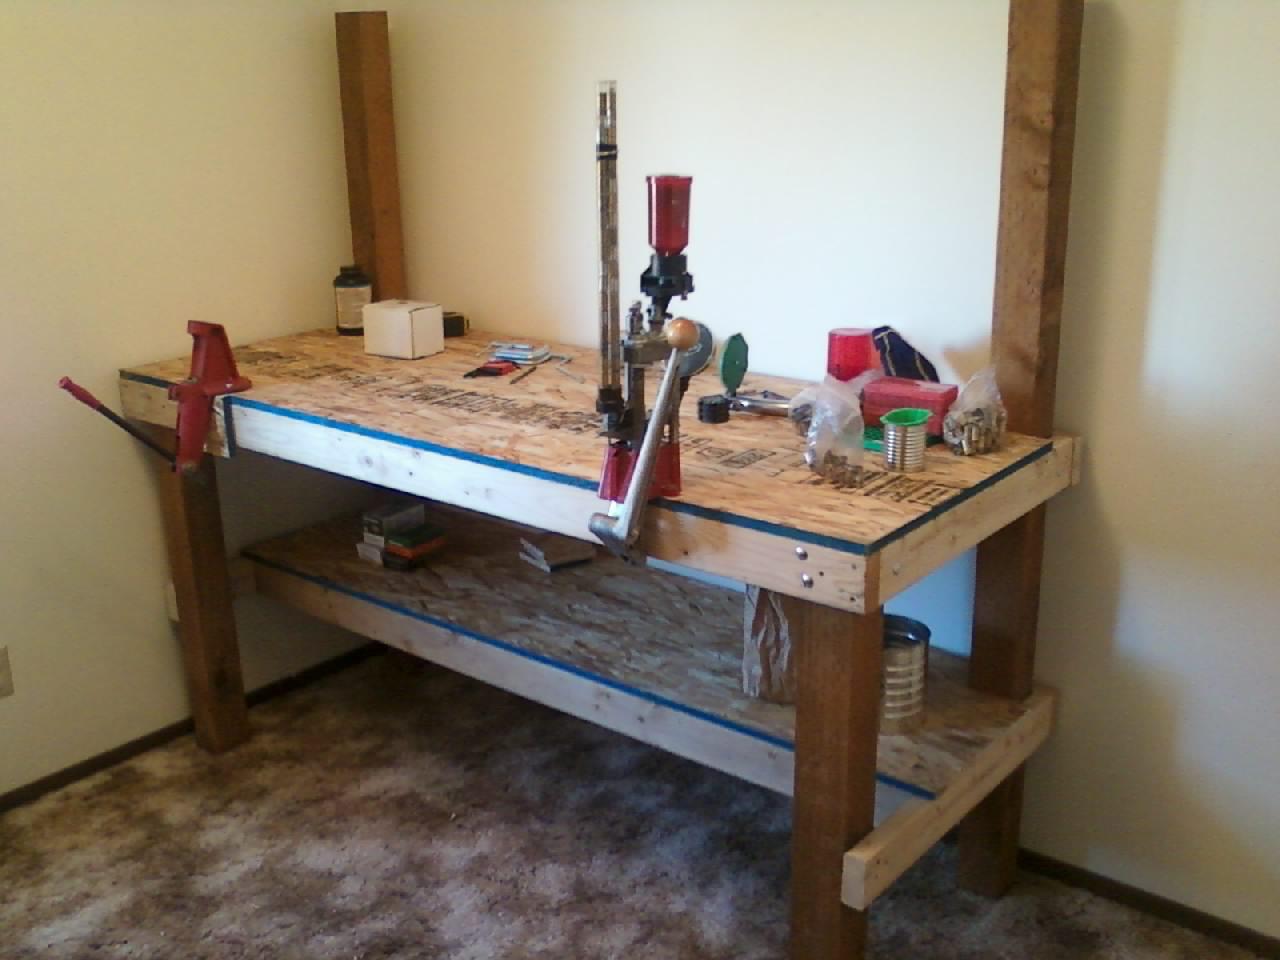 Let's See Your Reloading Bench-reloading-bench.jpg